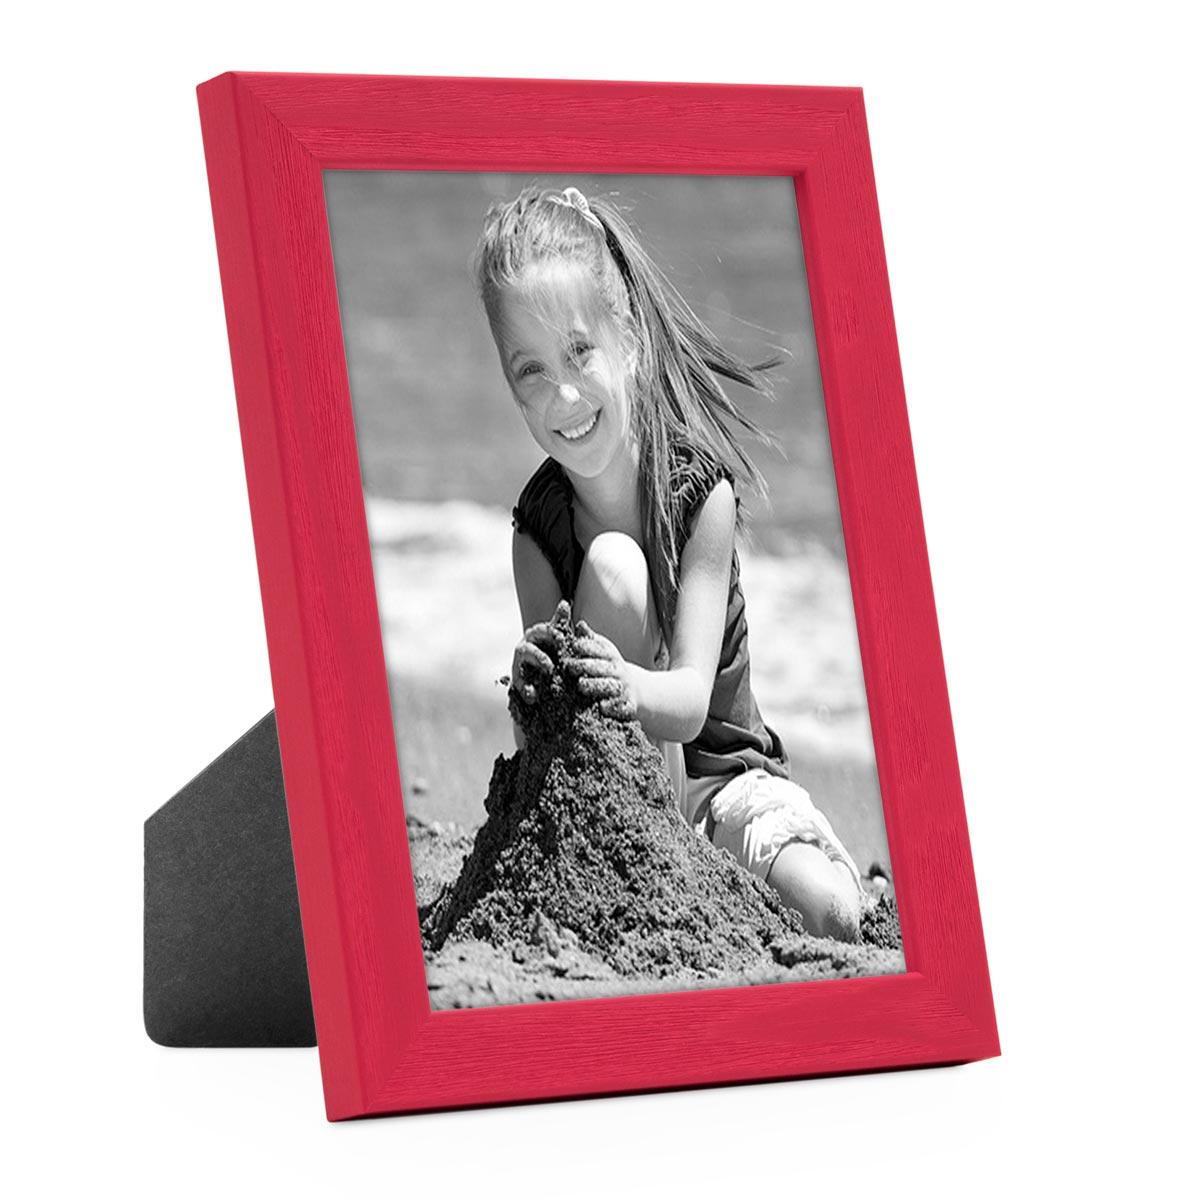 Bilderrahmen Rot Mit Acrylglas 10x15 Cm